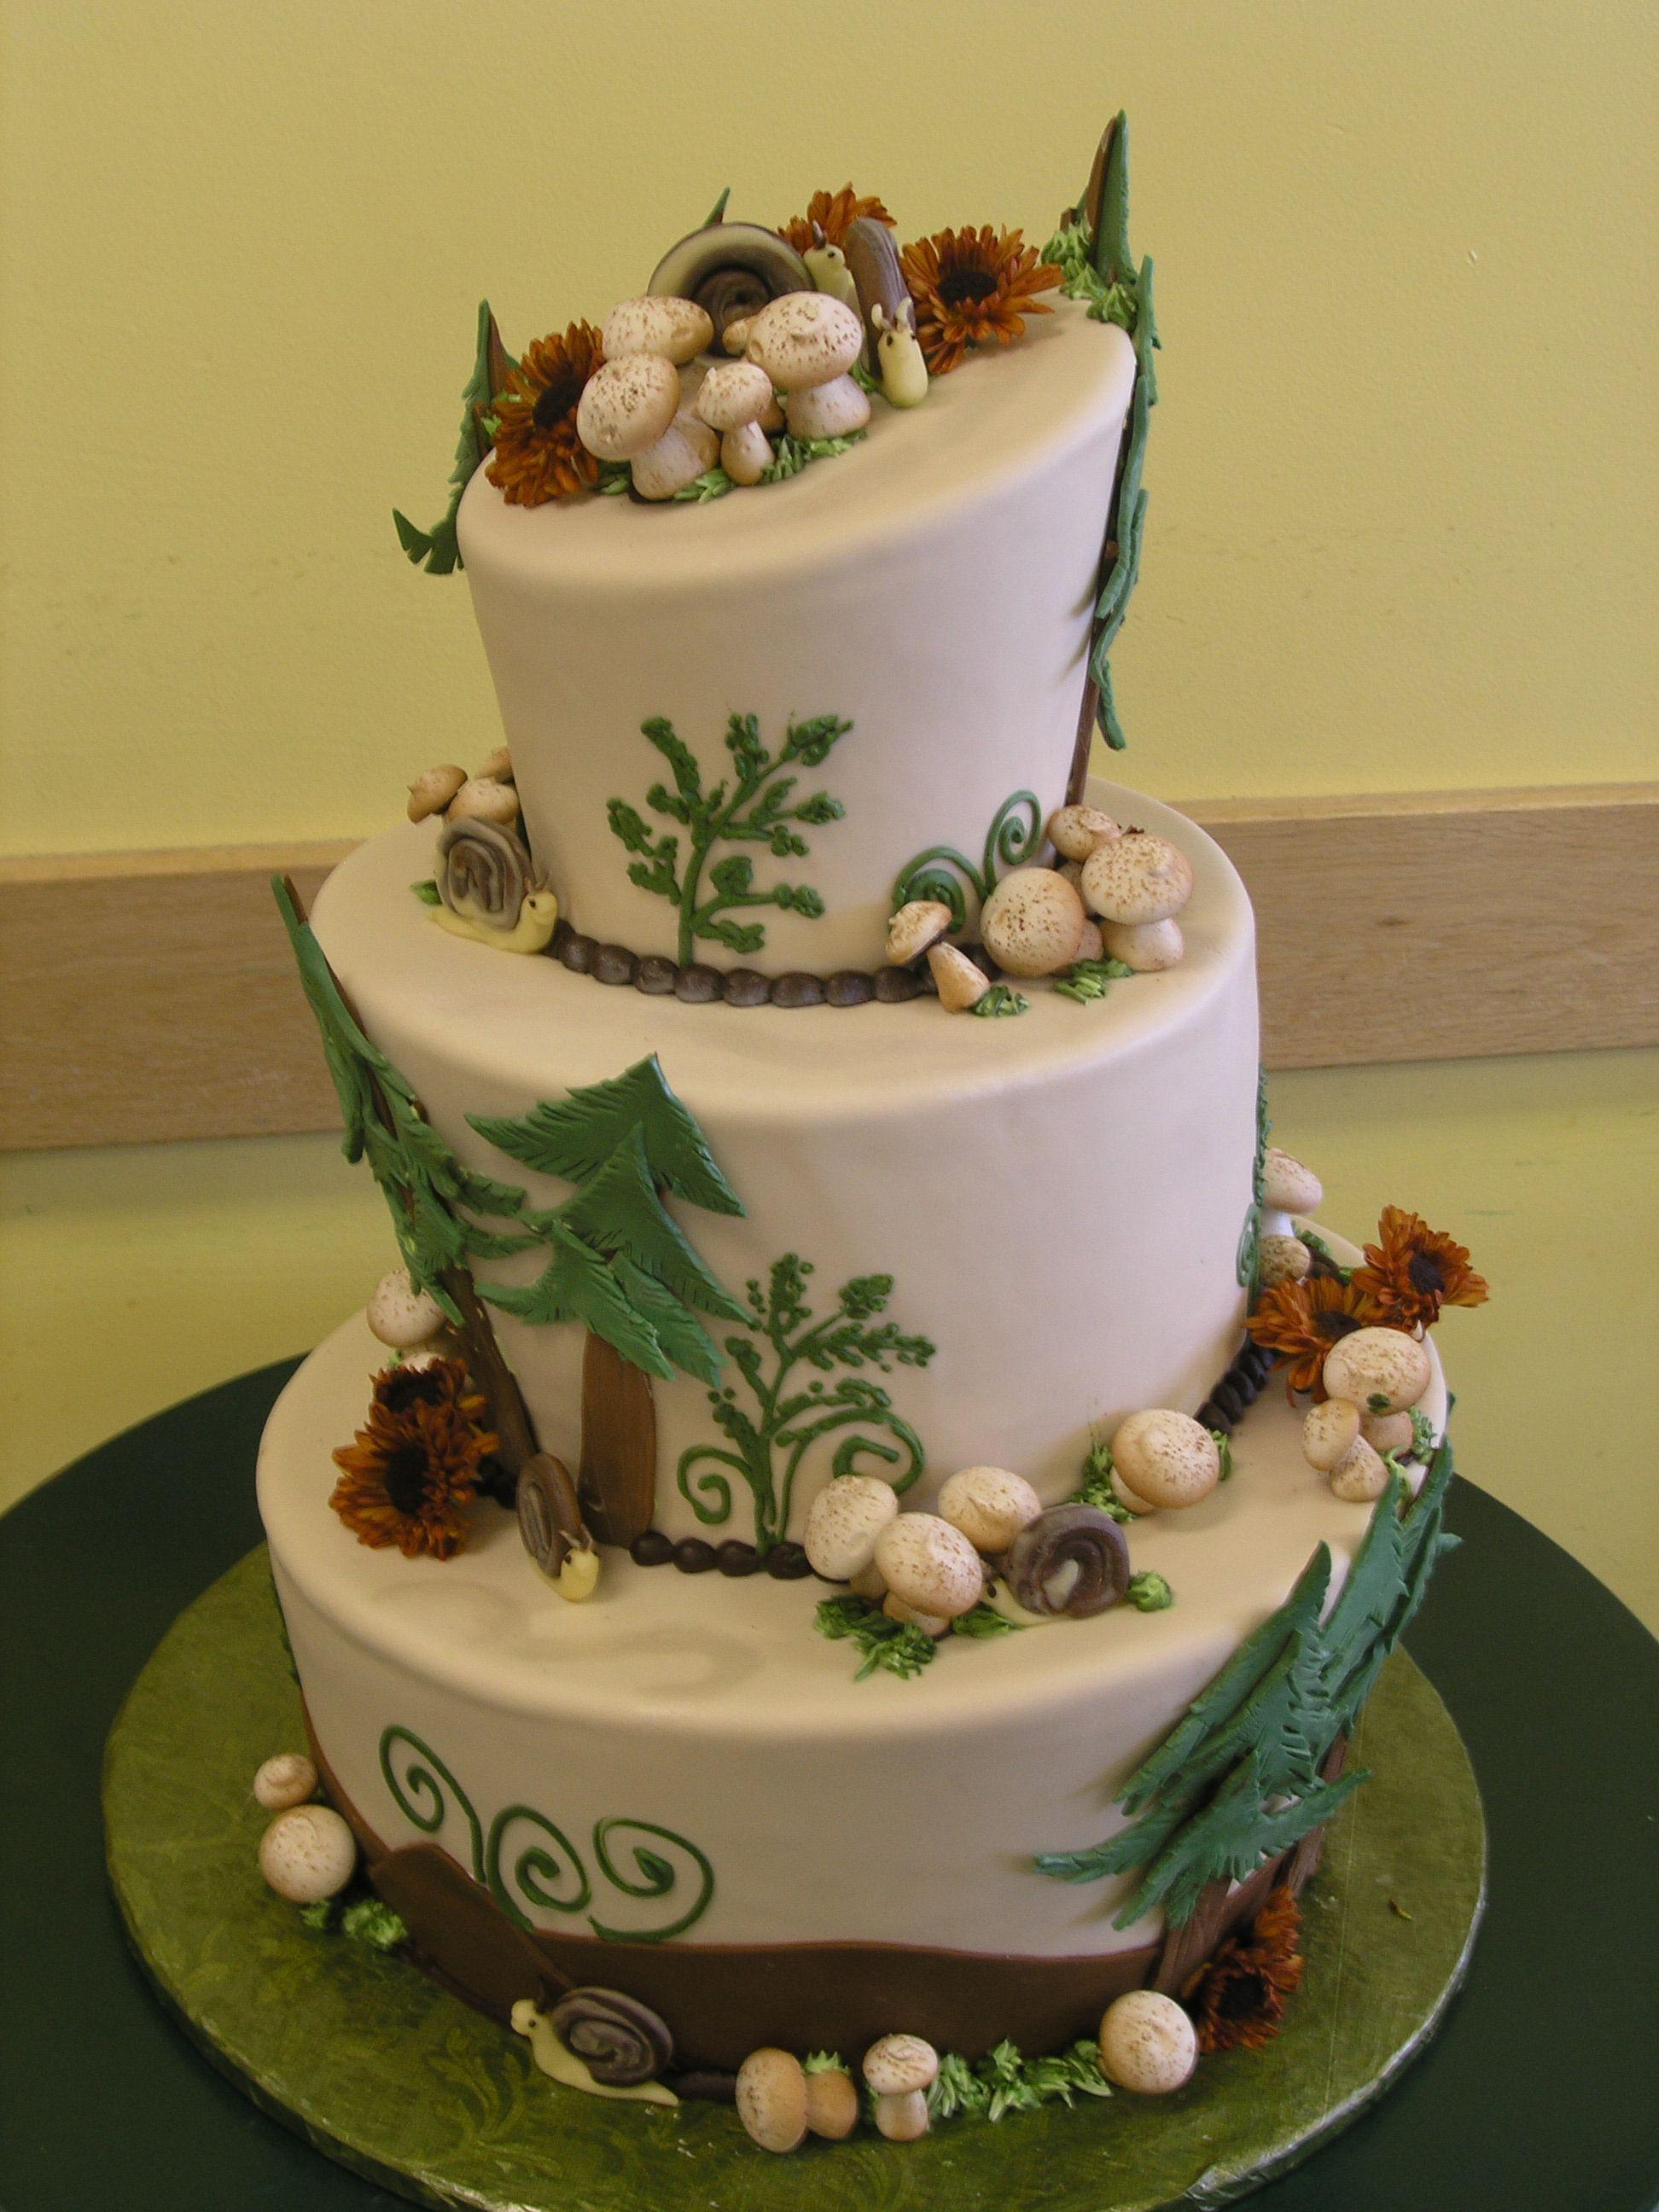 Nature forest cake | Extravagant Cakes | Pinterest